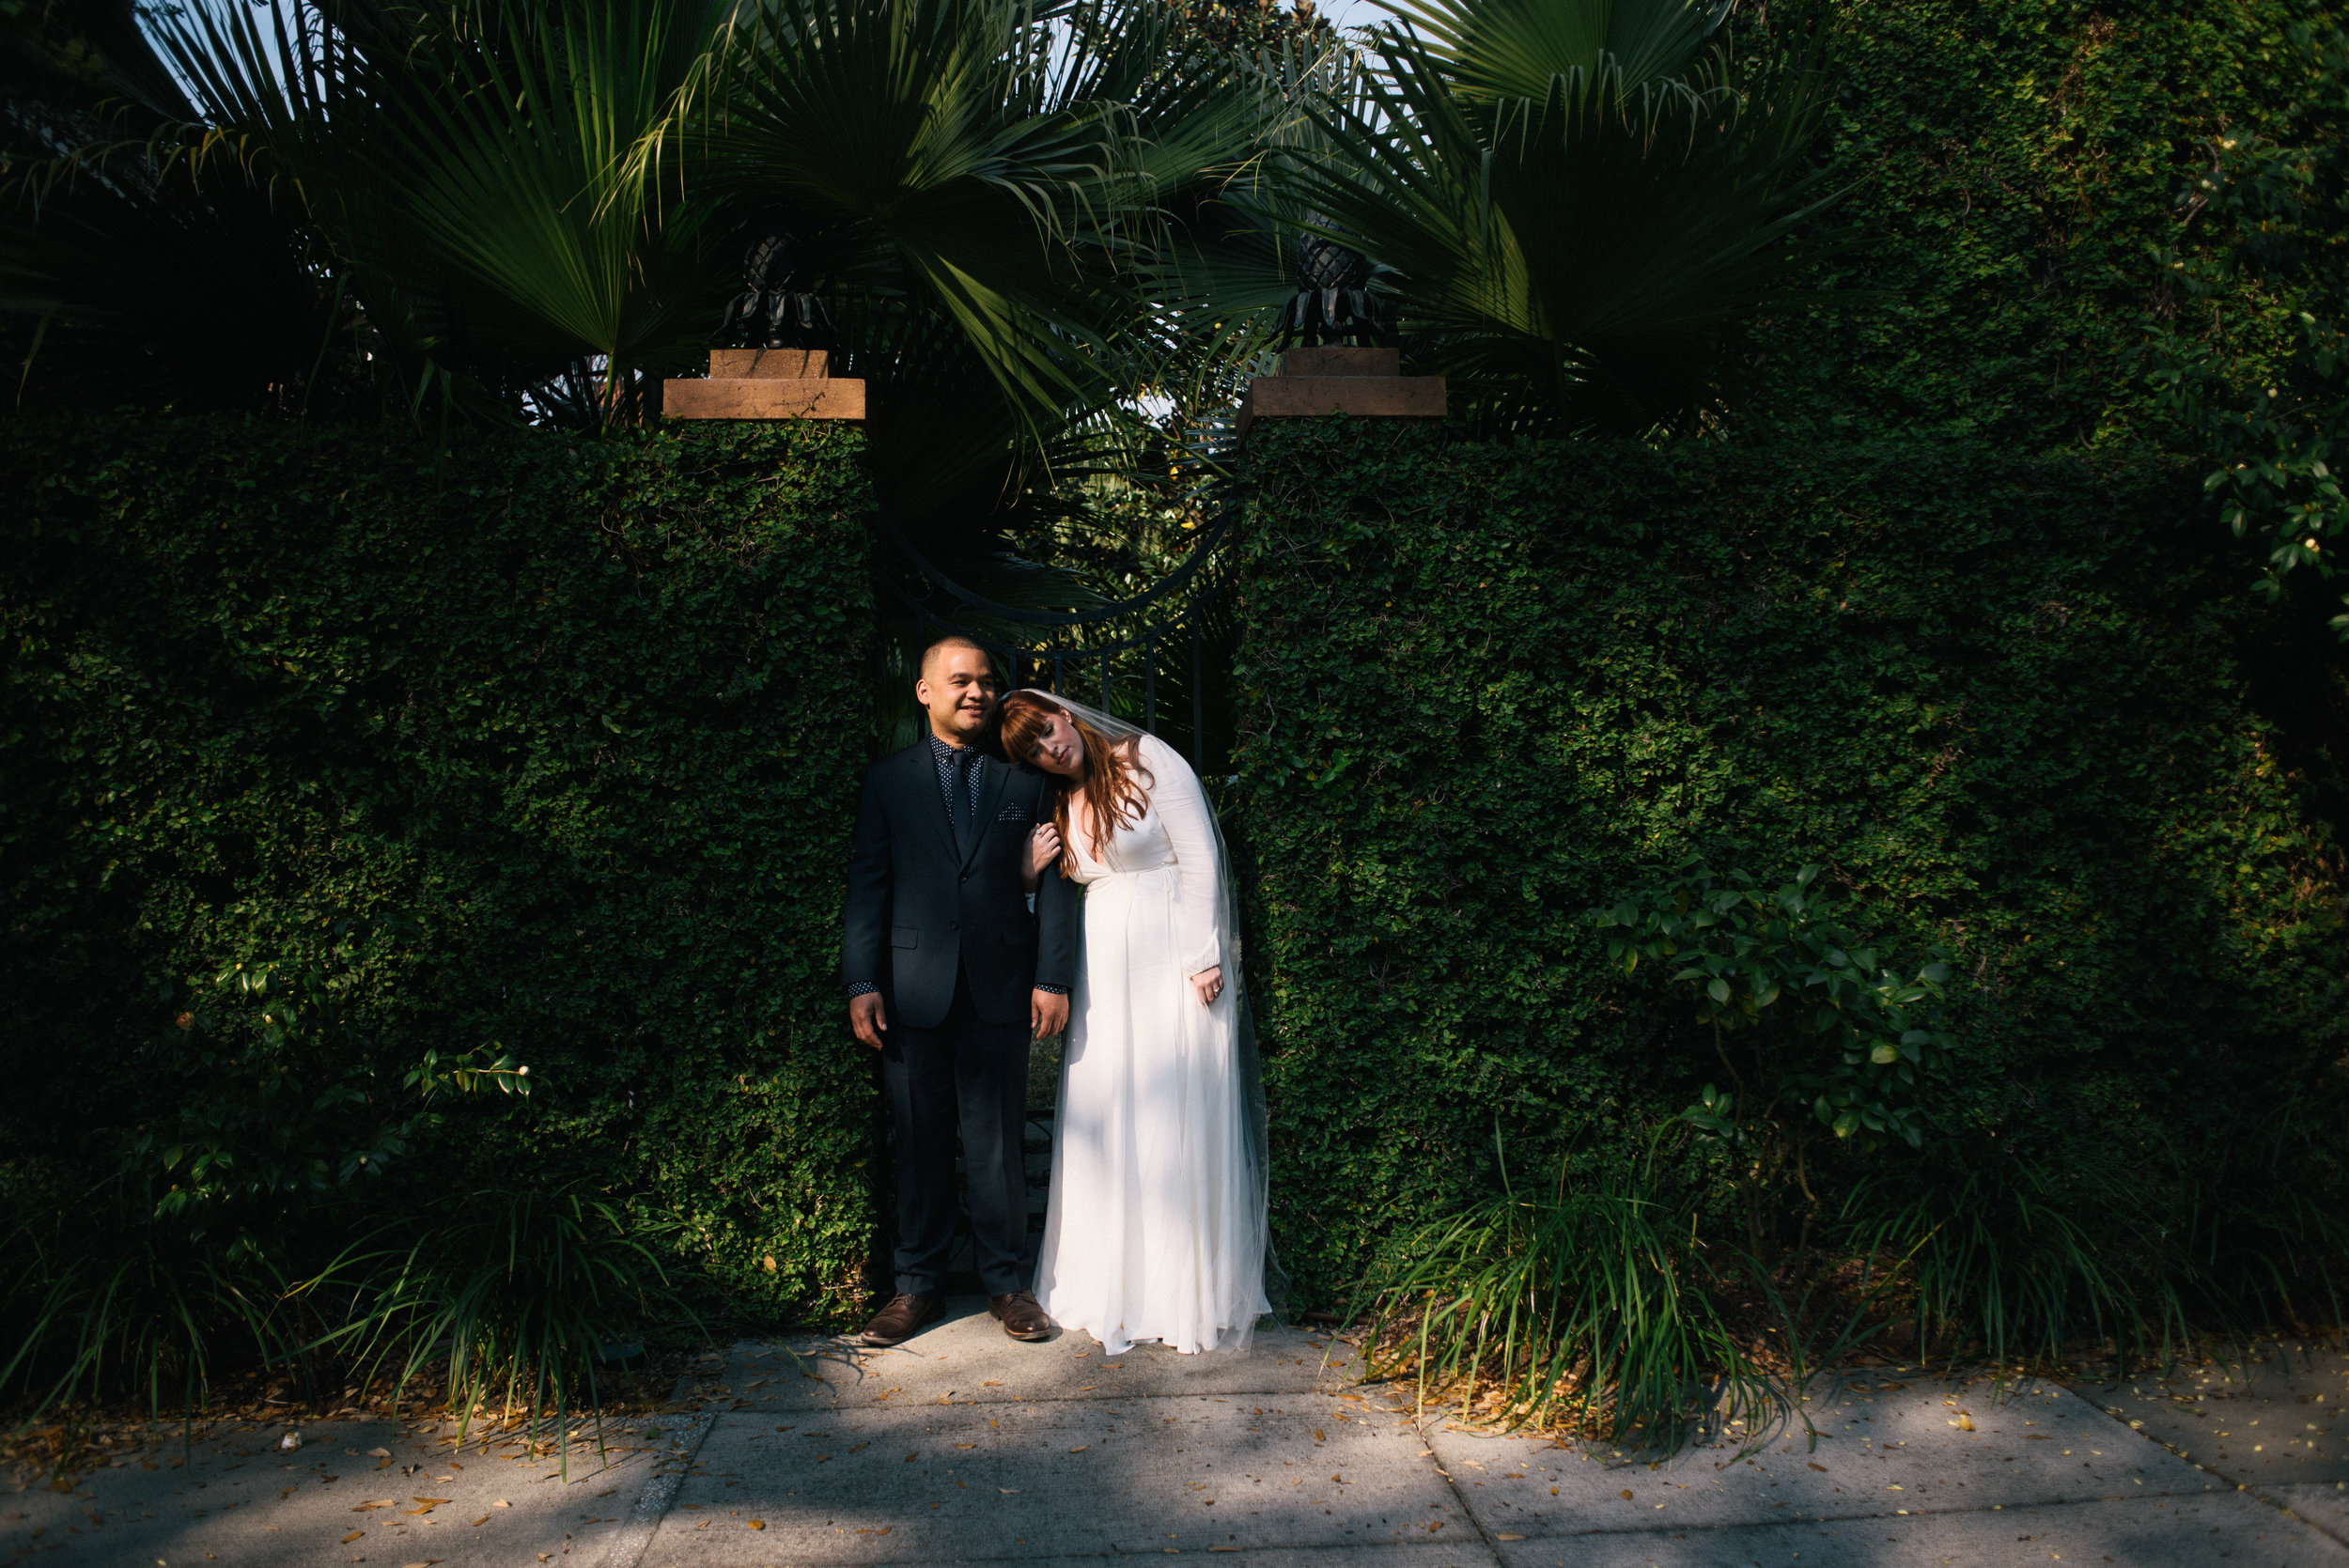 savannah-elopement-photography-savannah-georgia-elopement-photographer-savannah-wedding-photographer-meg-hill-photo-jade-hill- (21 of 58).jpg